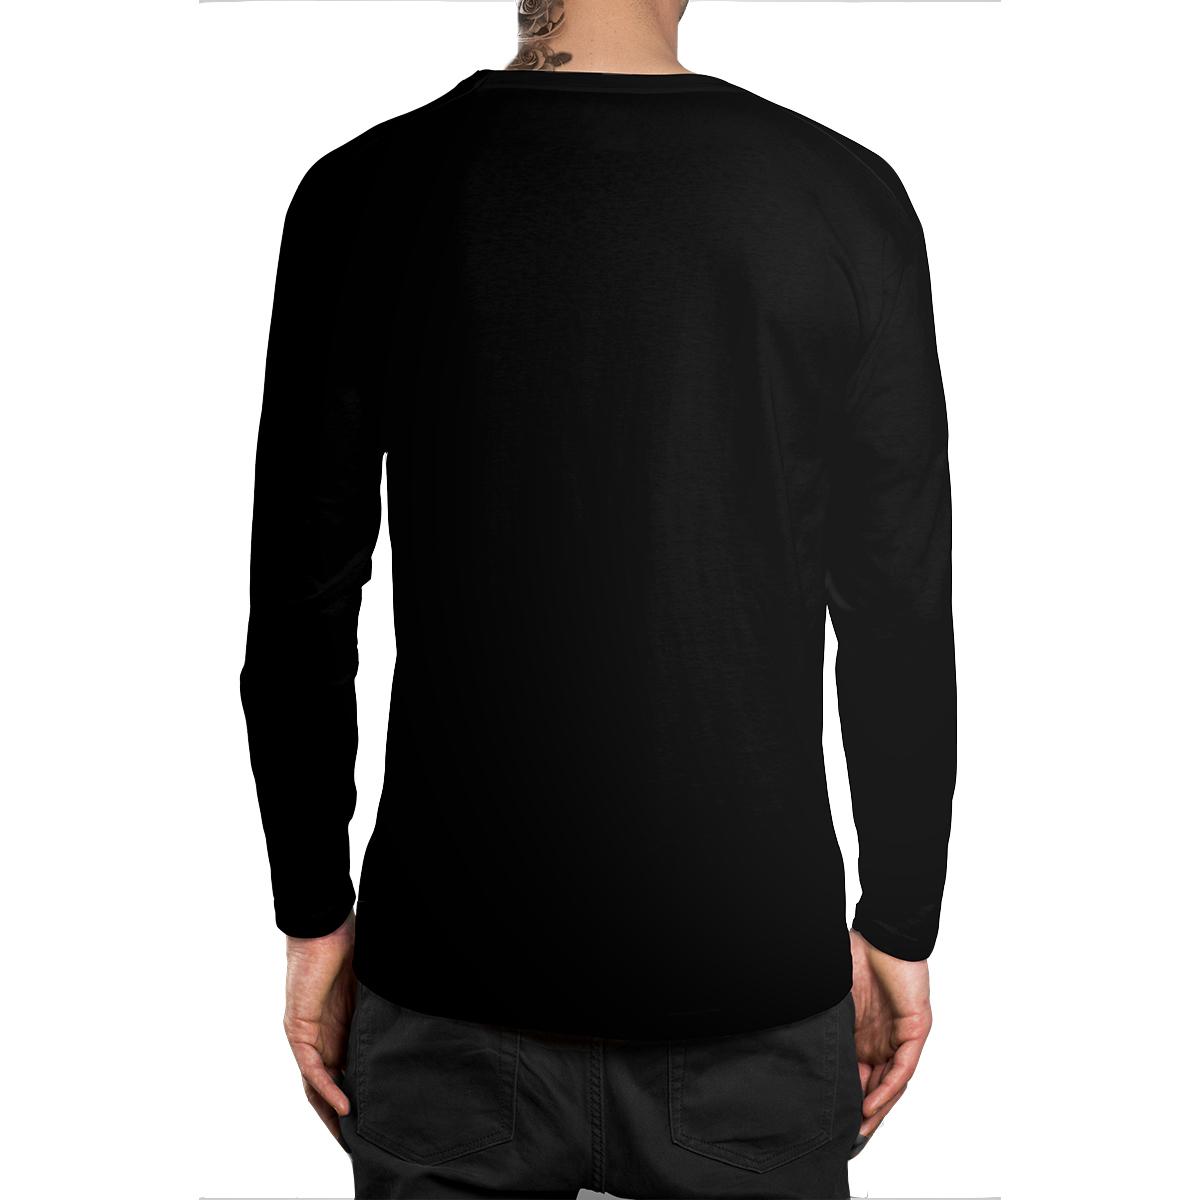 Stompy Camiseta Manga Longa Modelo 28